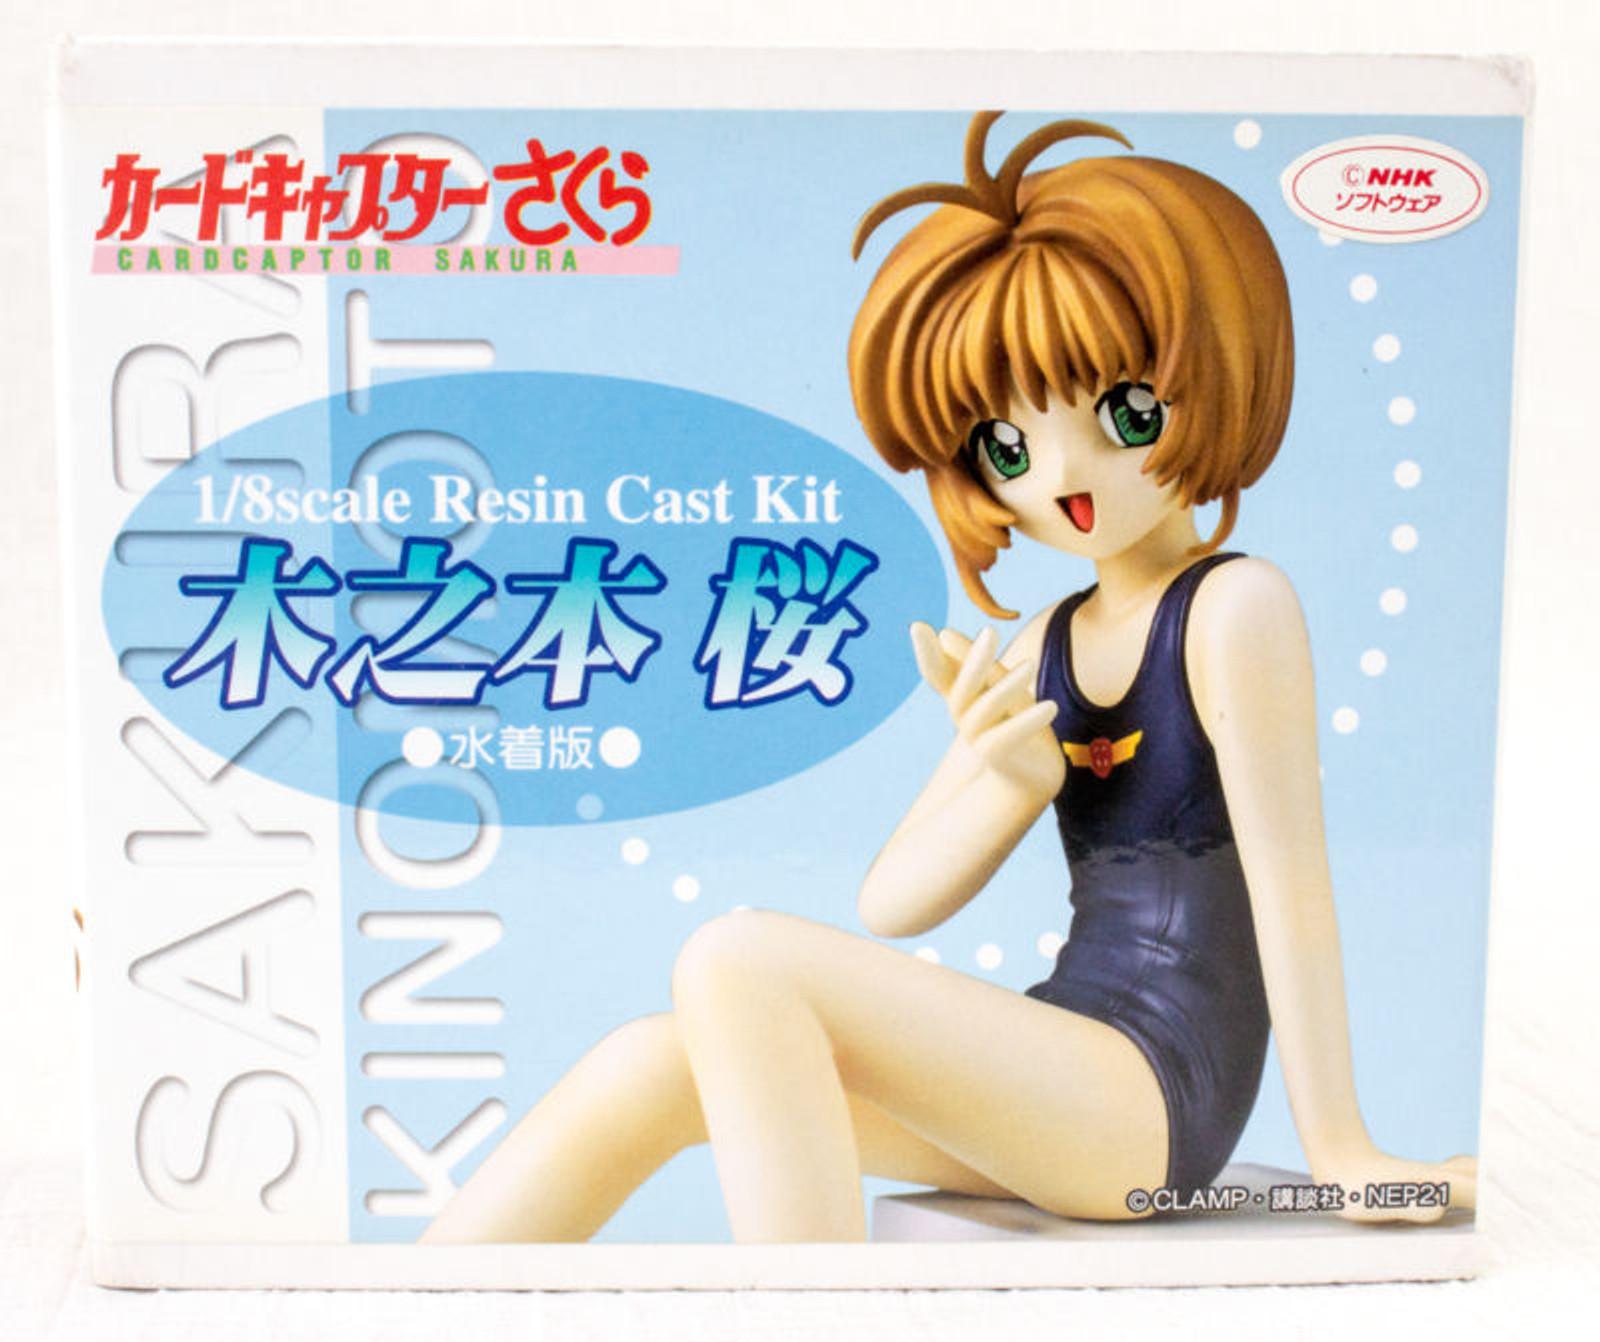 RARE Cardcaptor Sakura 1/8 scale Resin Kit Figure Swimwear Ver. CLAMP Kotobukiya JAPAN